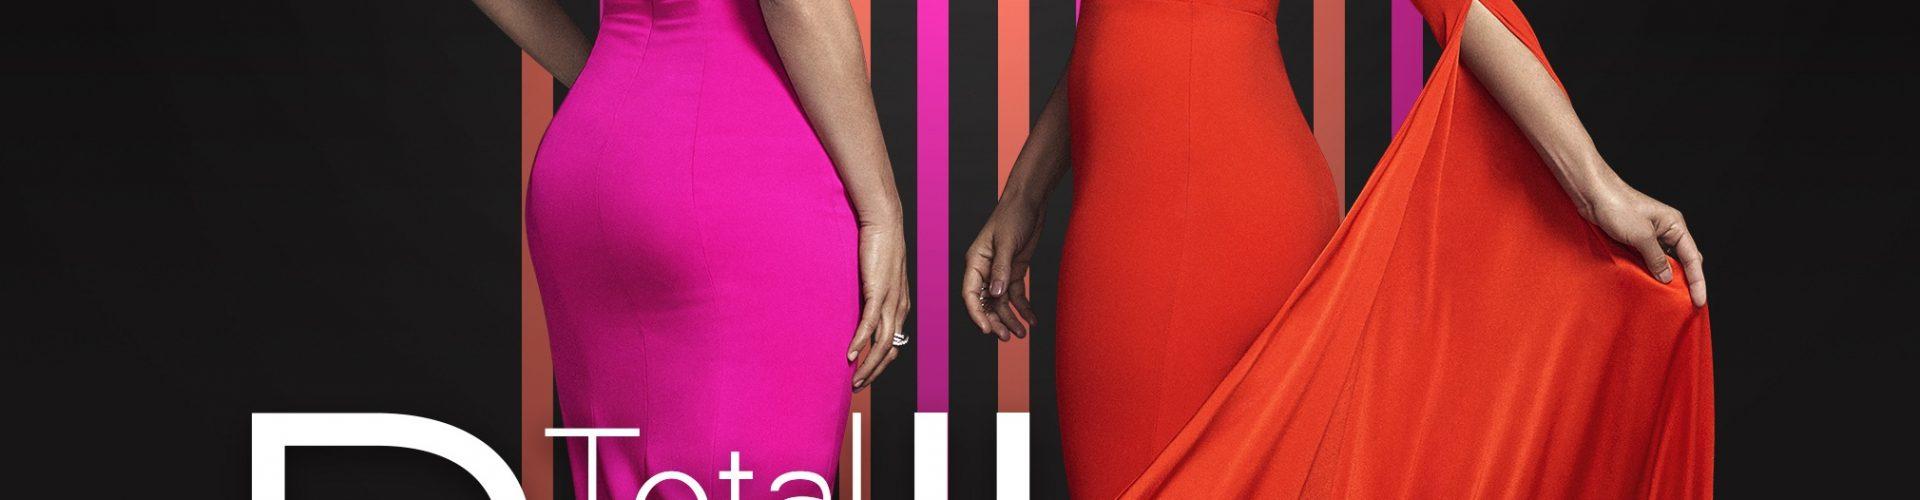 Peta sezona serije TOTAL BELLAS od 19. aprila na kanalu E!